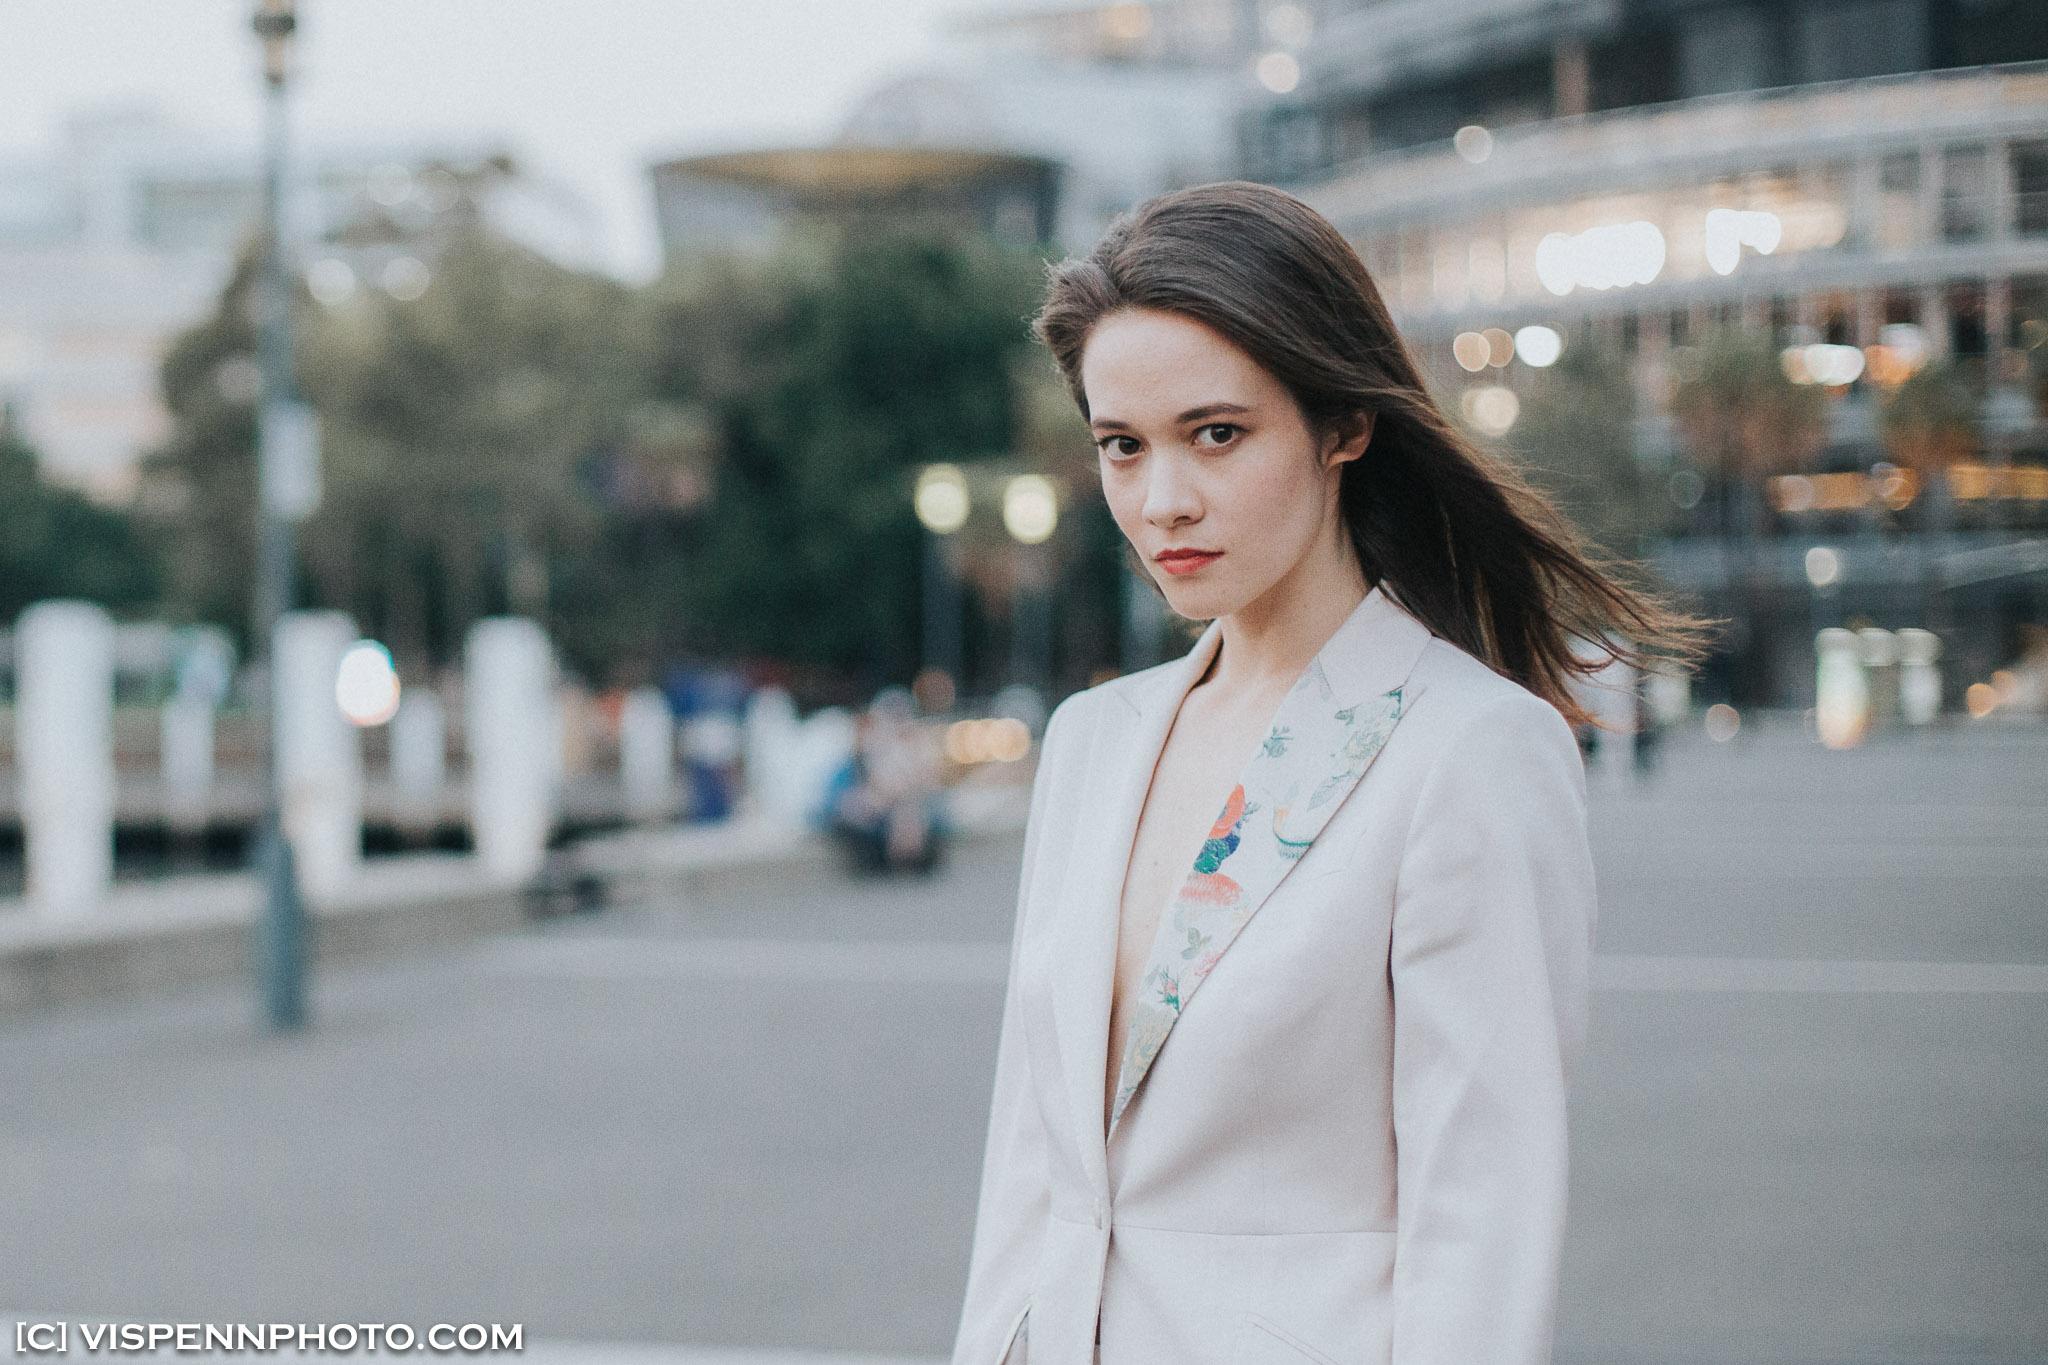 Melbourne Fashion Portrait Commercial Photography VISPENN 墨尔本 服装 商业 人像 摄影 AACTA D2 4904 2P EOSR VISPENN